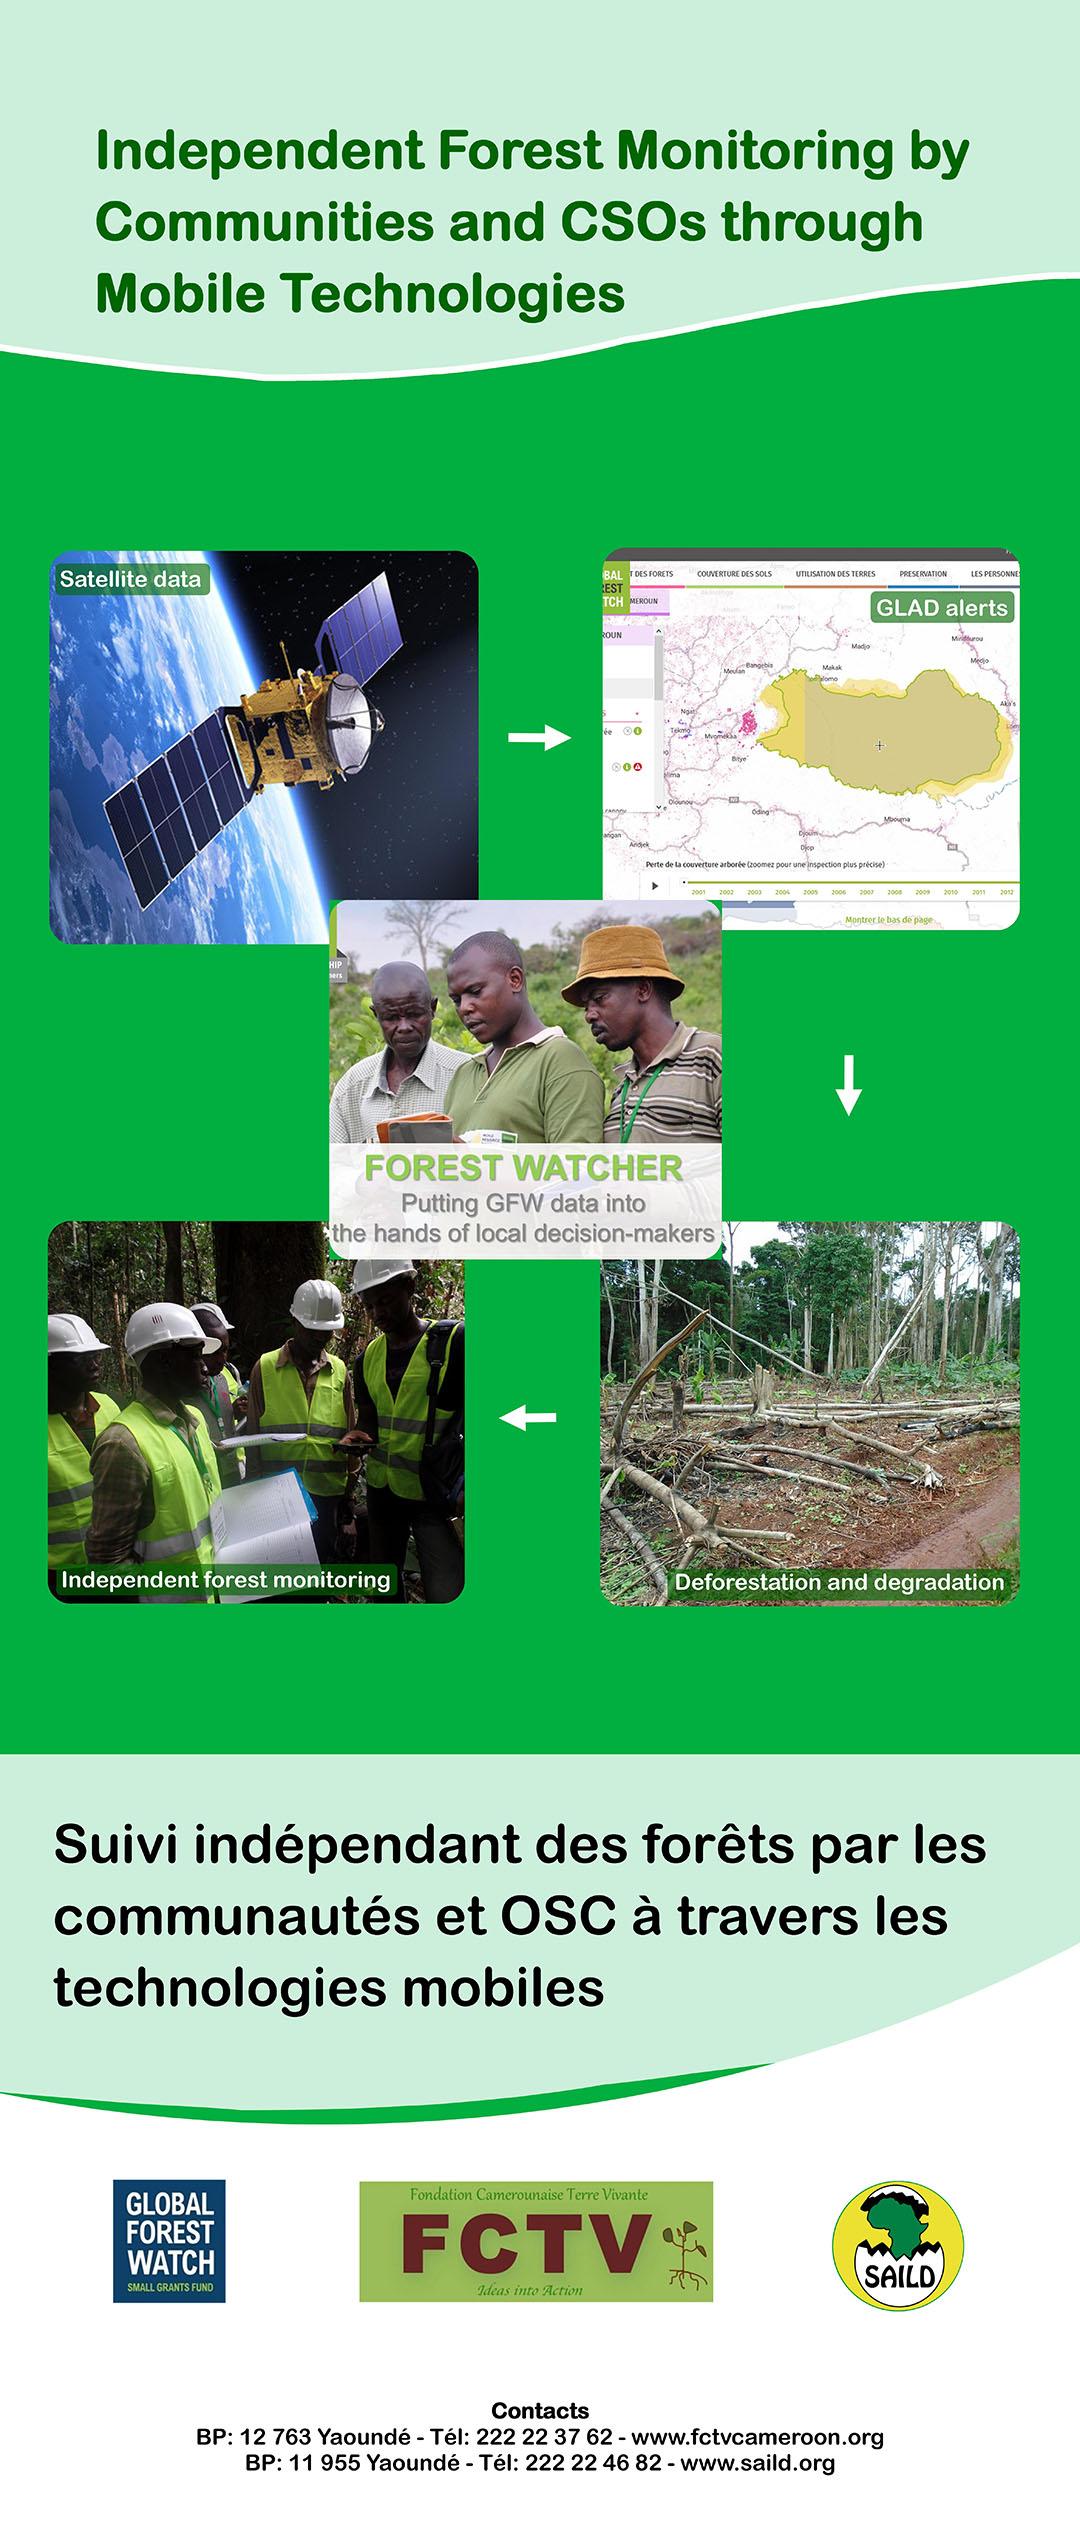 Fondation Camerounaise de la Terre Vivante (FCTV)